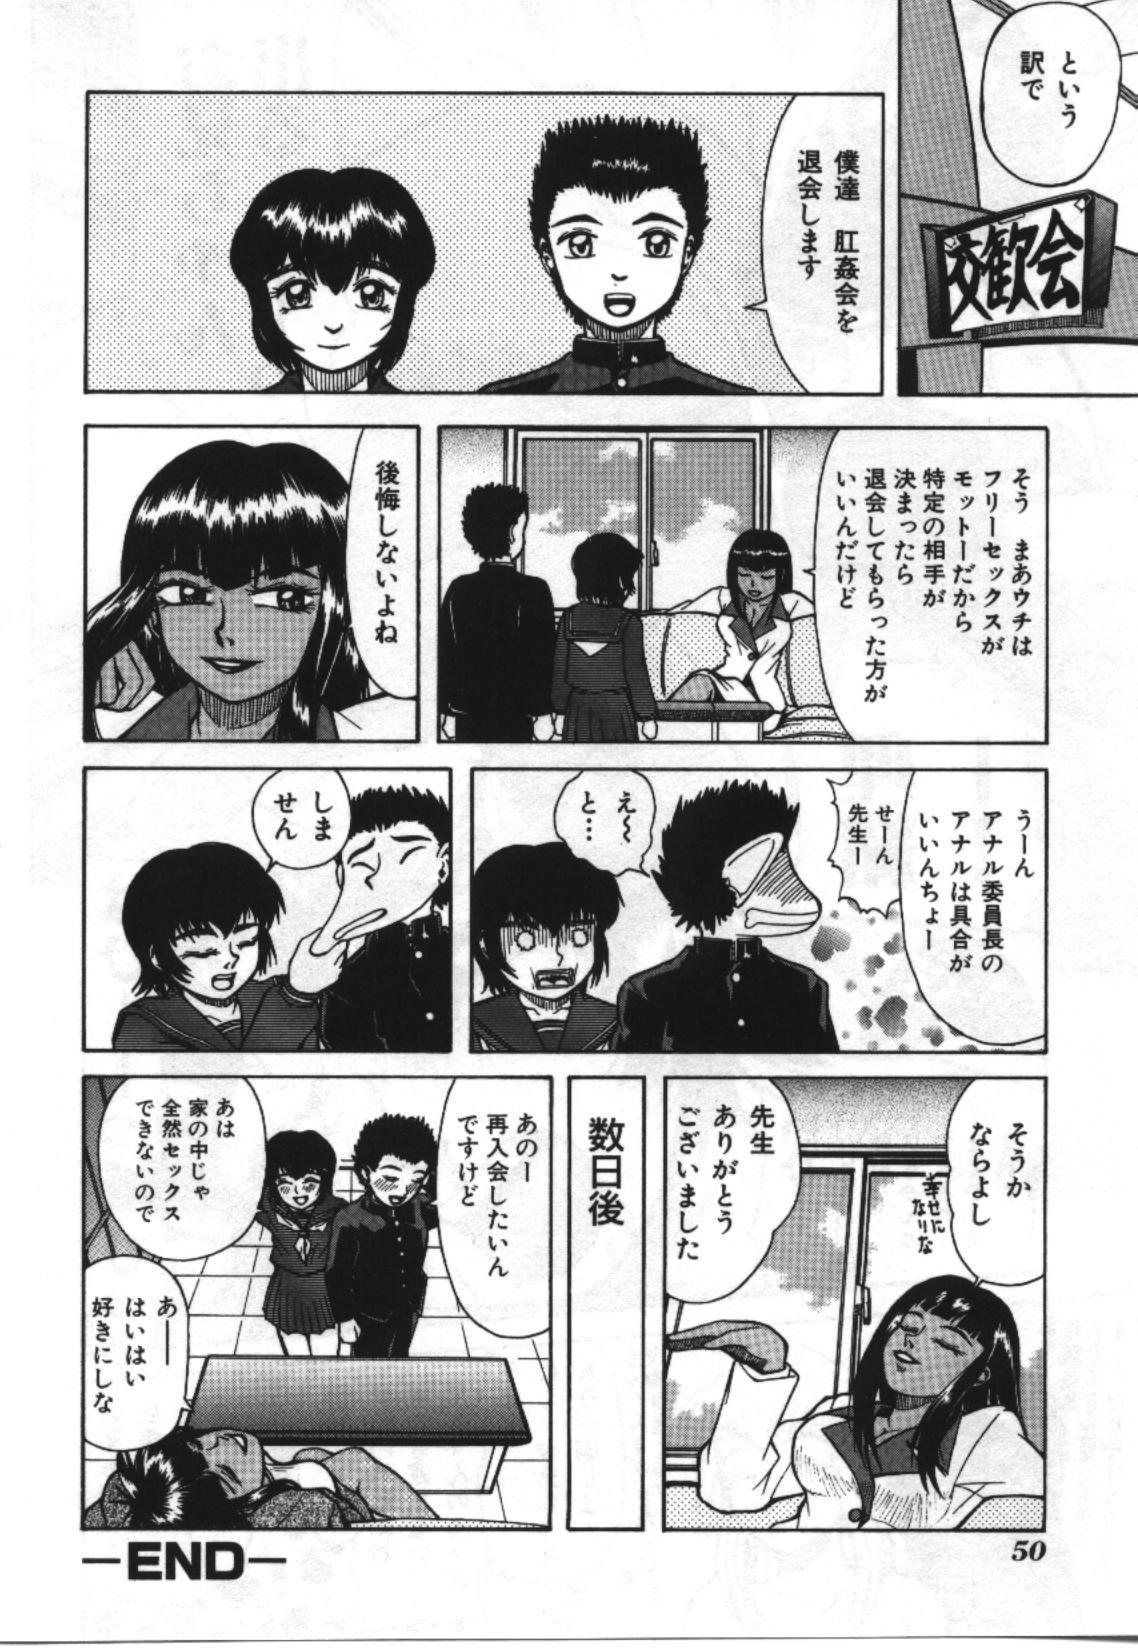 Imouto Koishi 2 49